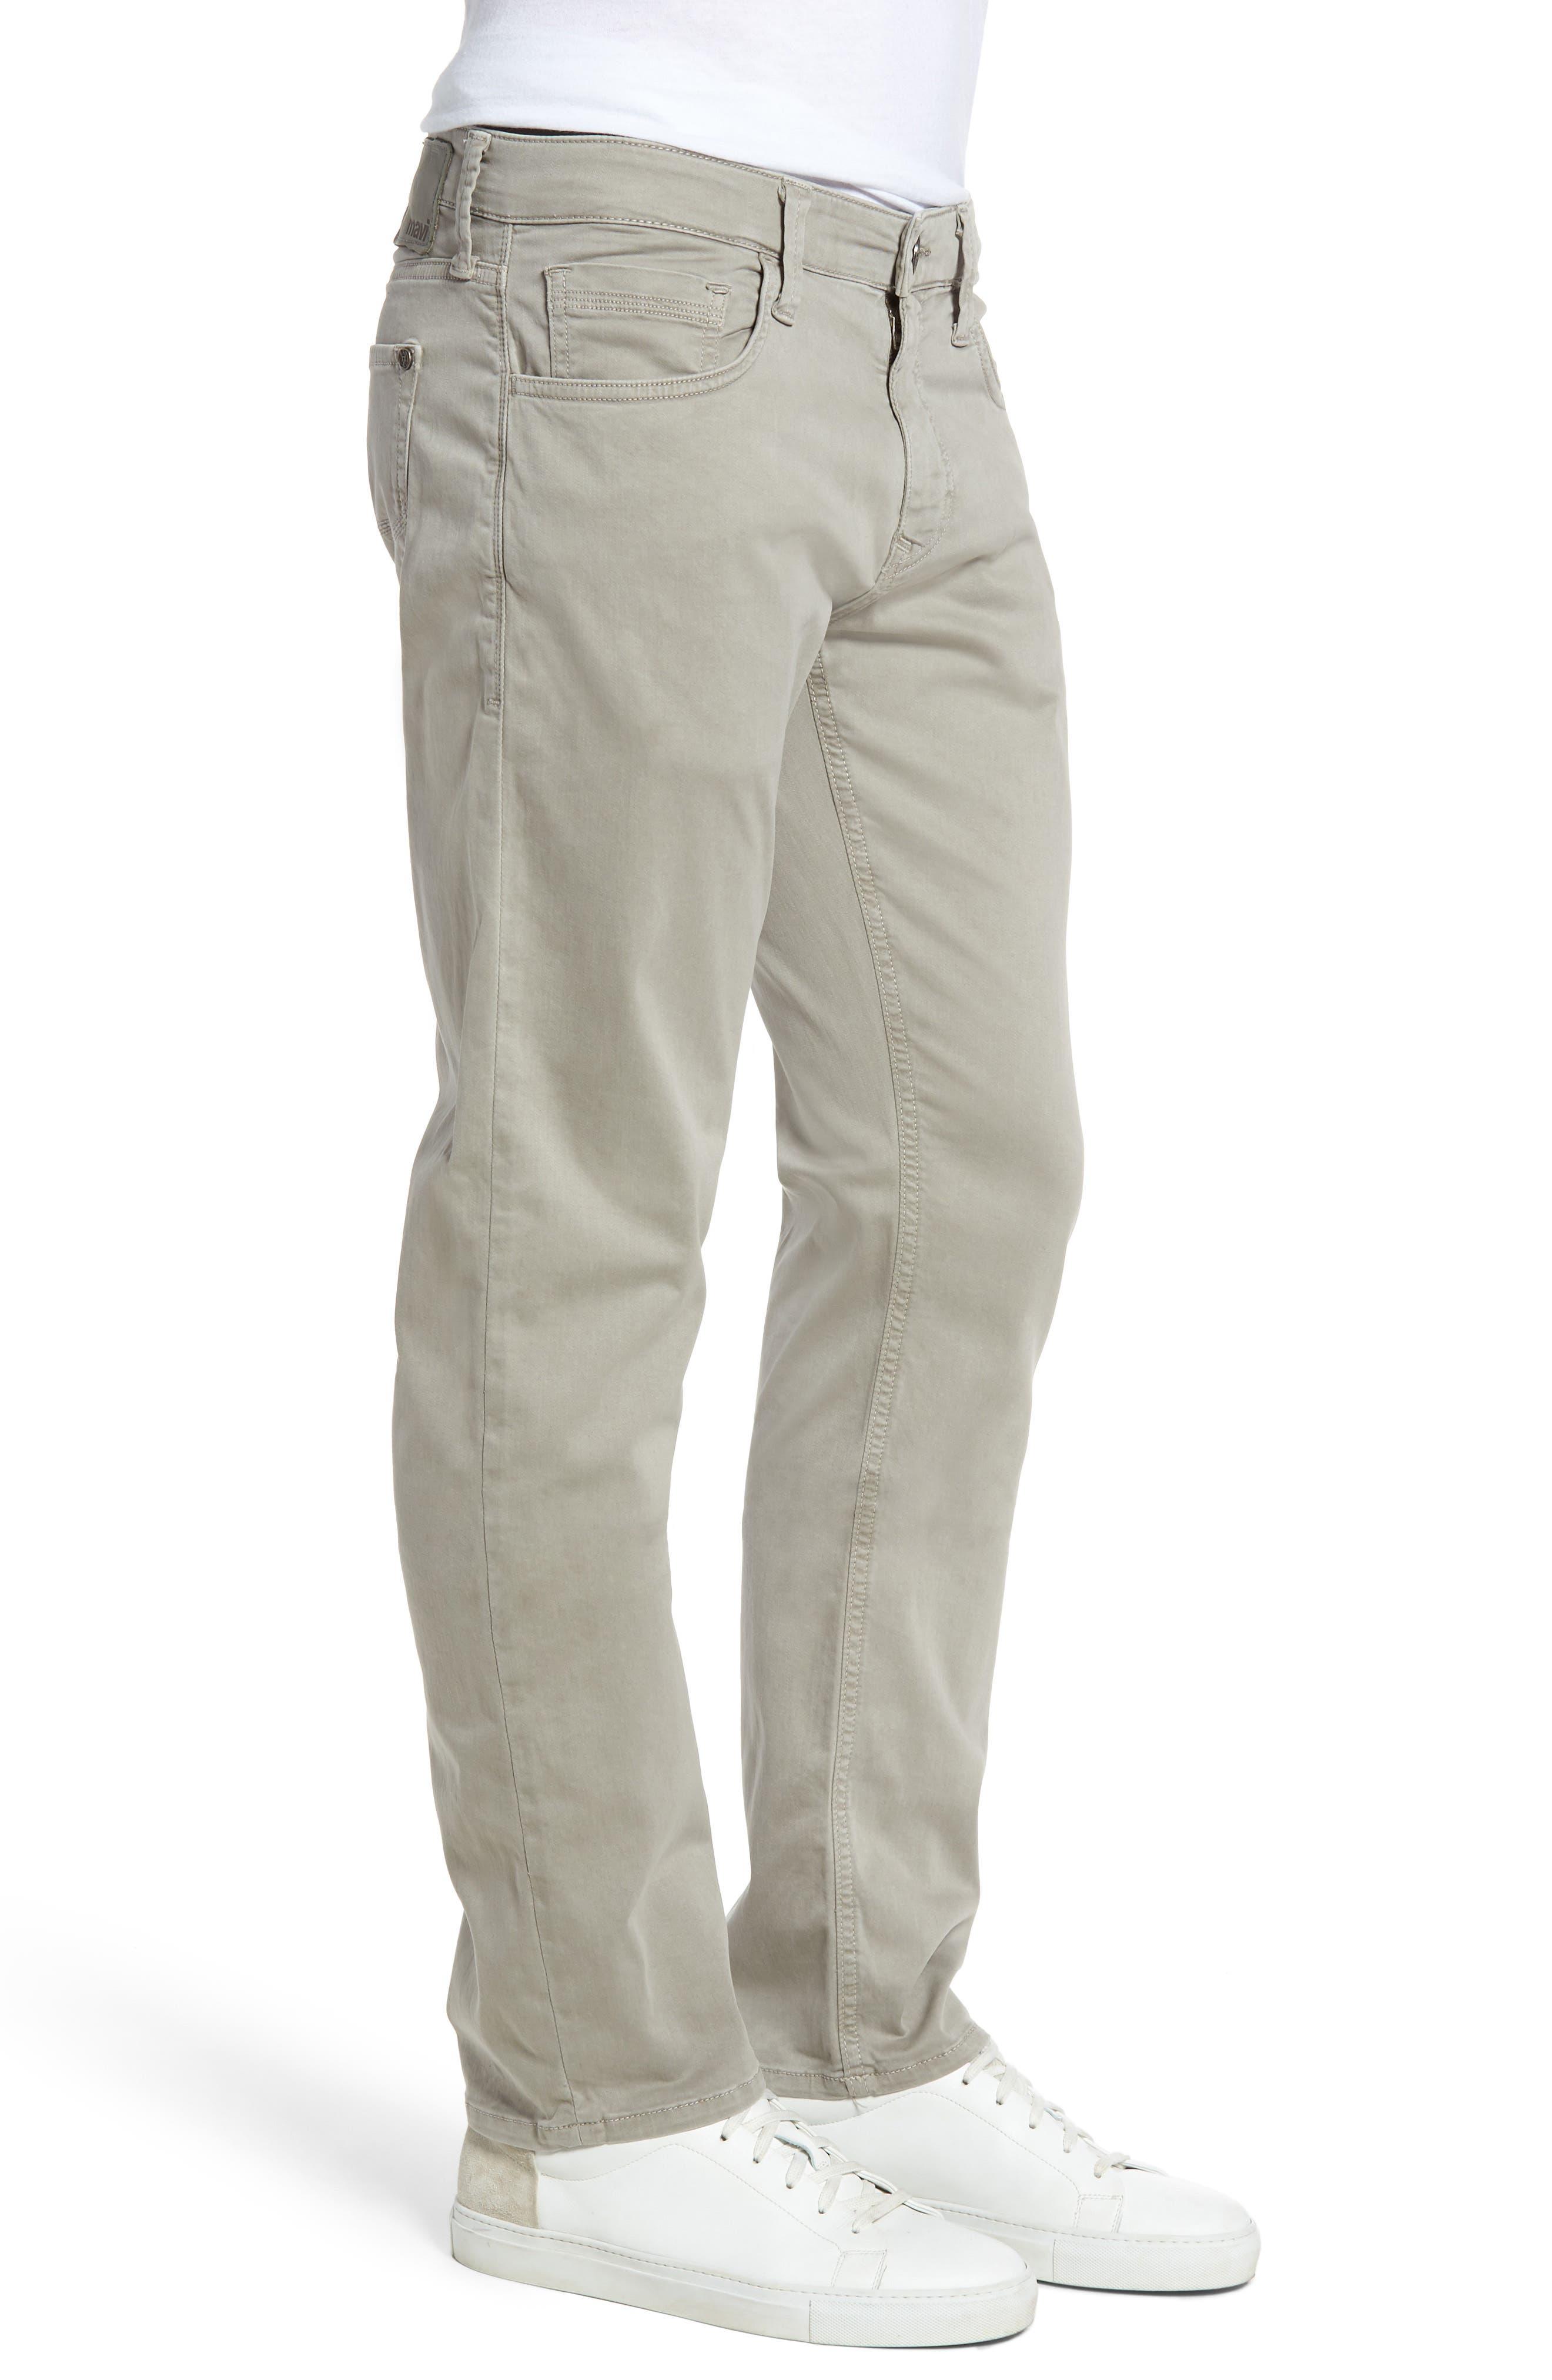 Zach Straight Leg Pants,                             Alternate thumbnail 3, color,                             ZACH GREY TWILL